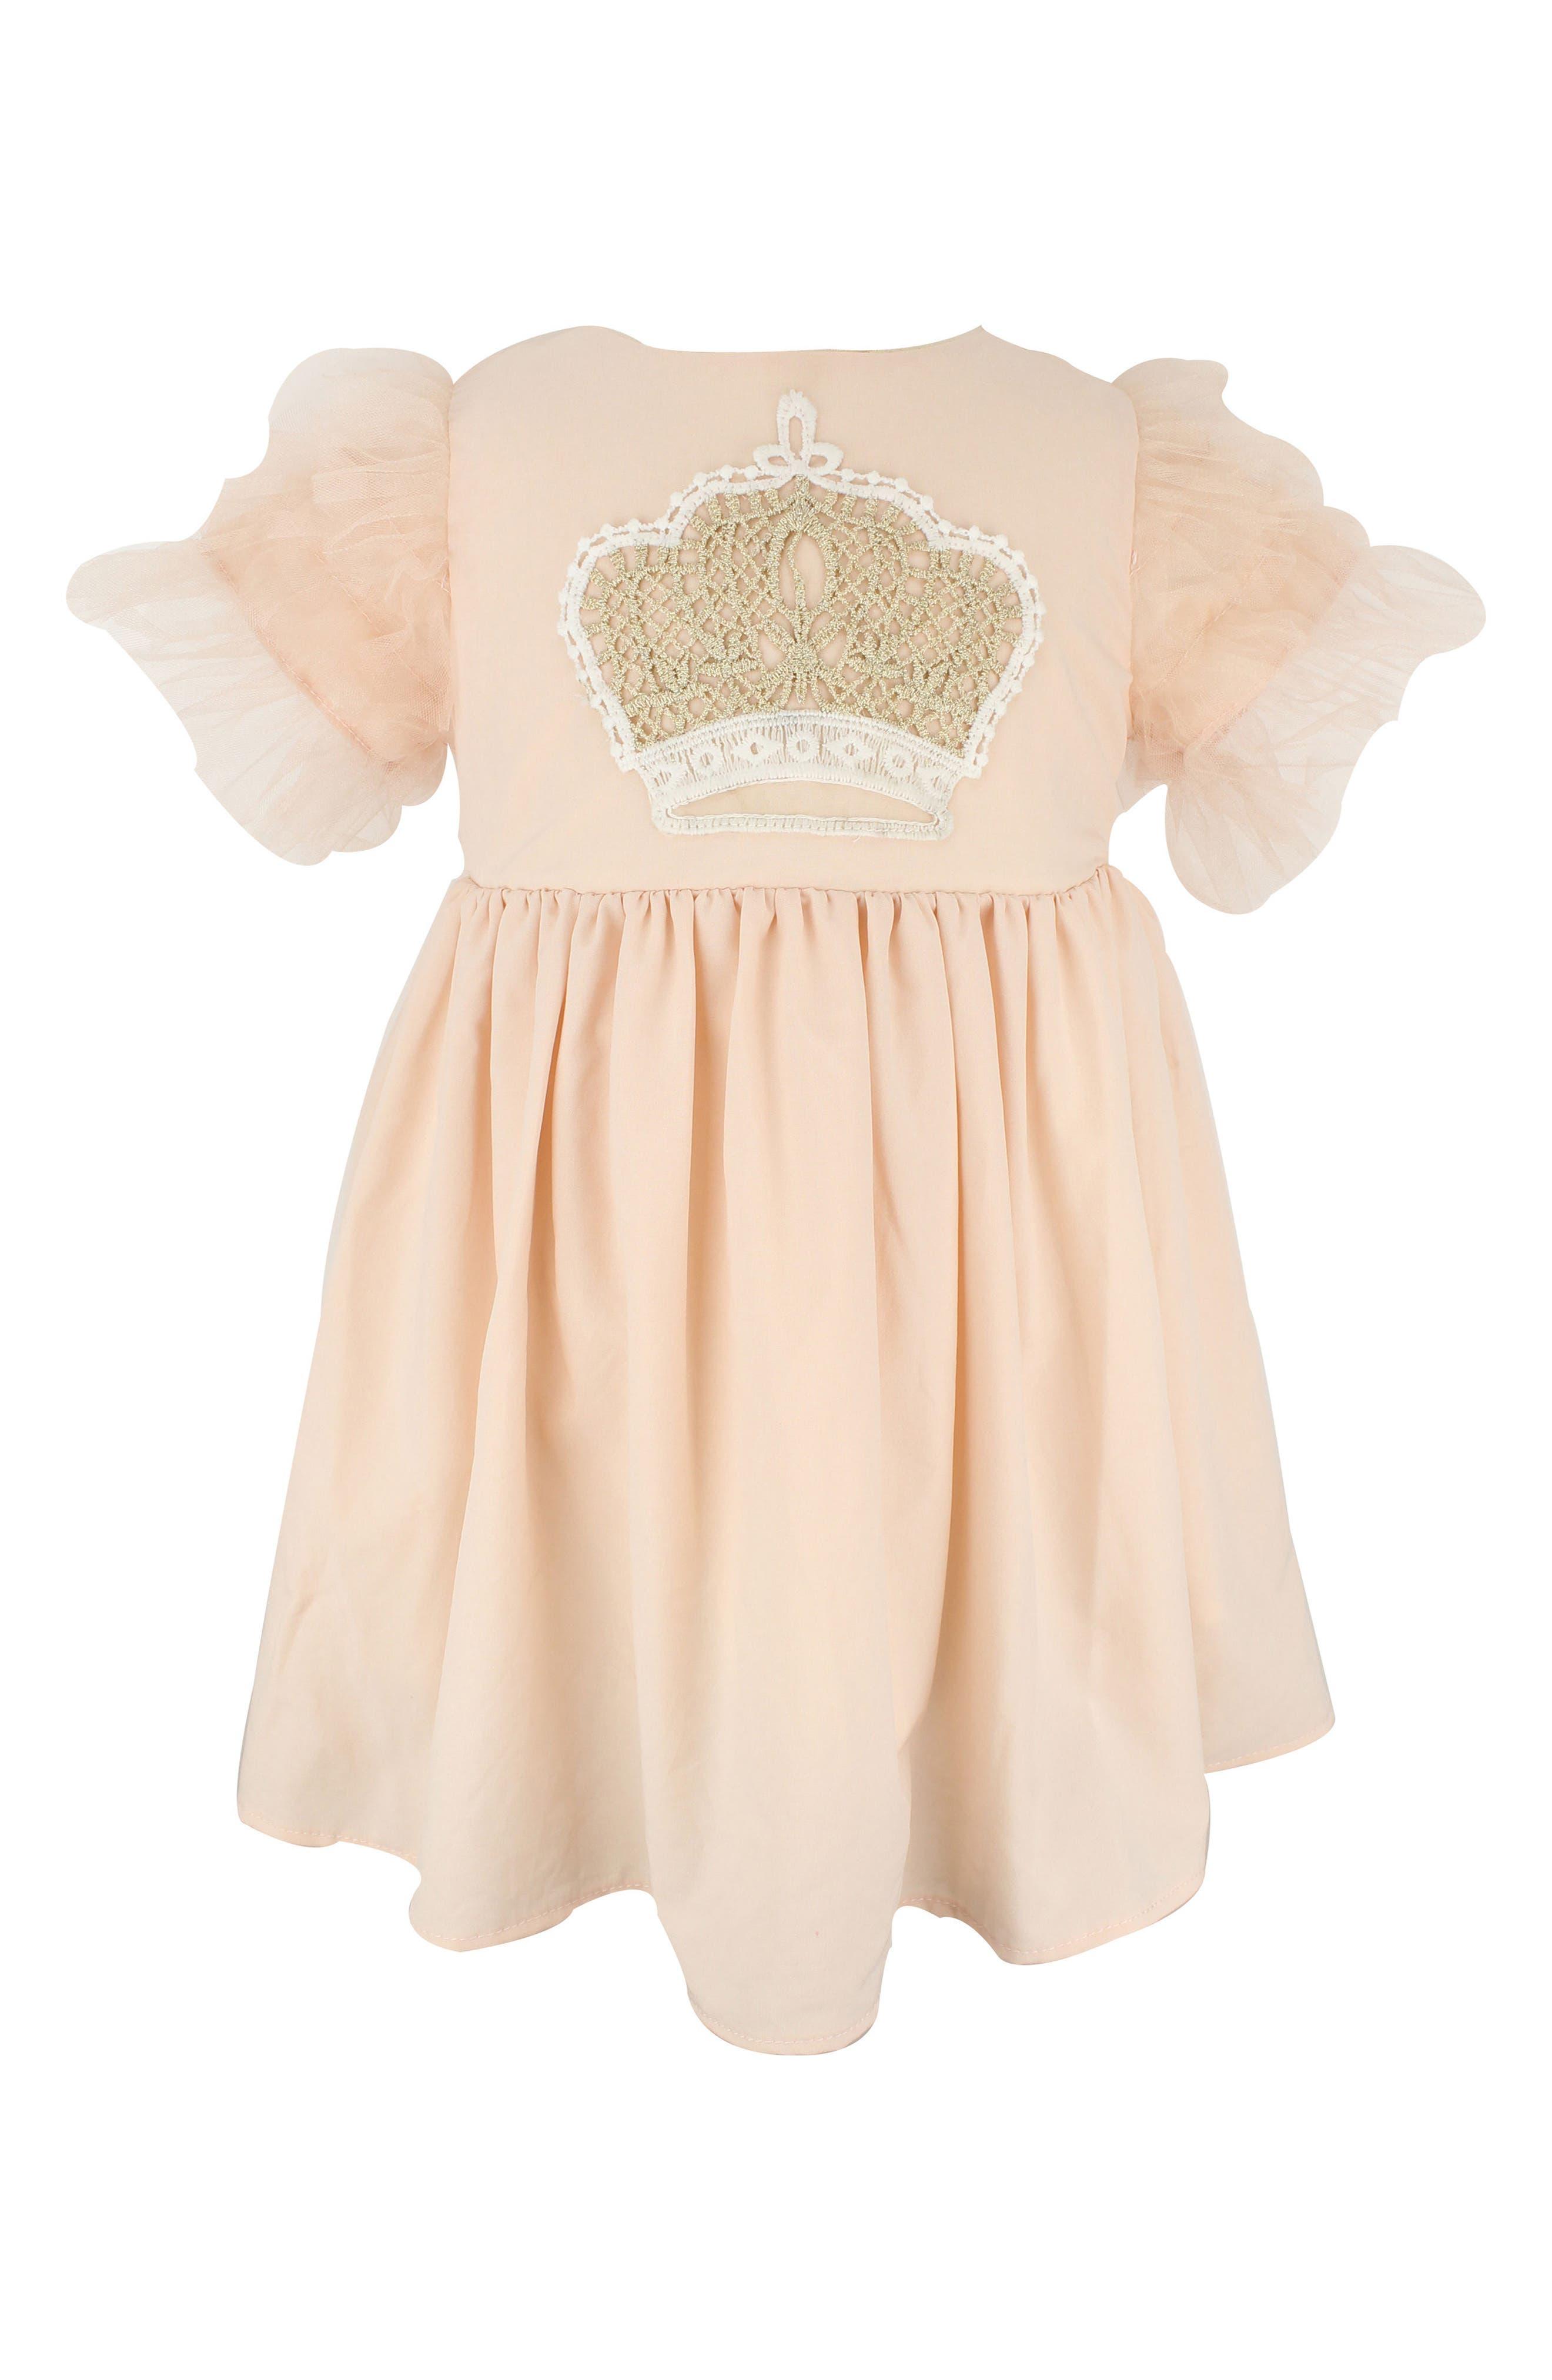 Crown Appliqué Dress,                             Main thumbnail 1, color,                             Peach